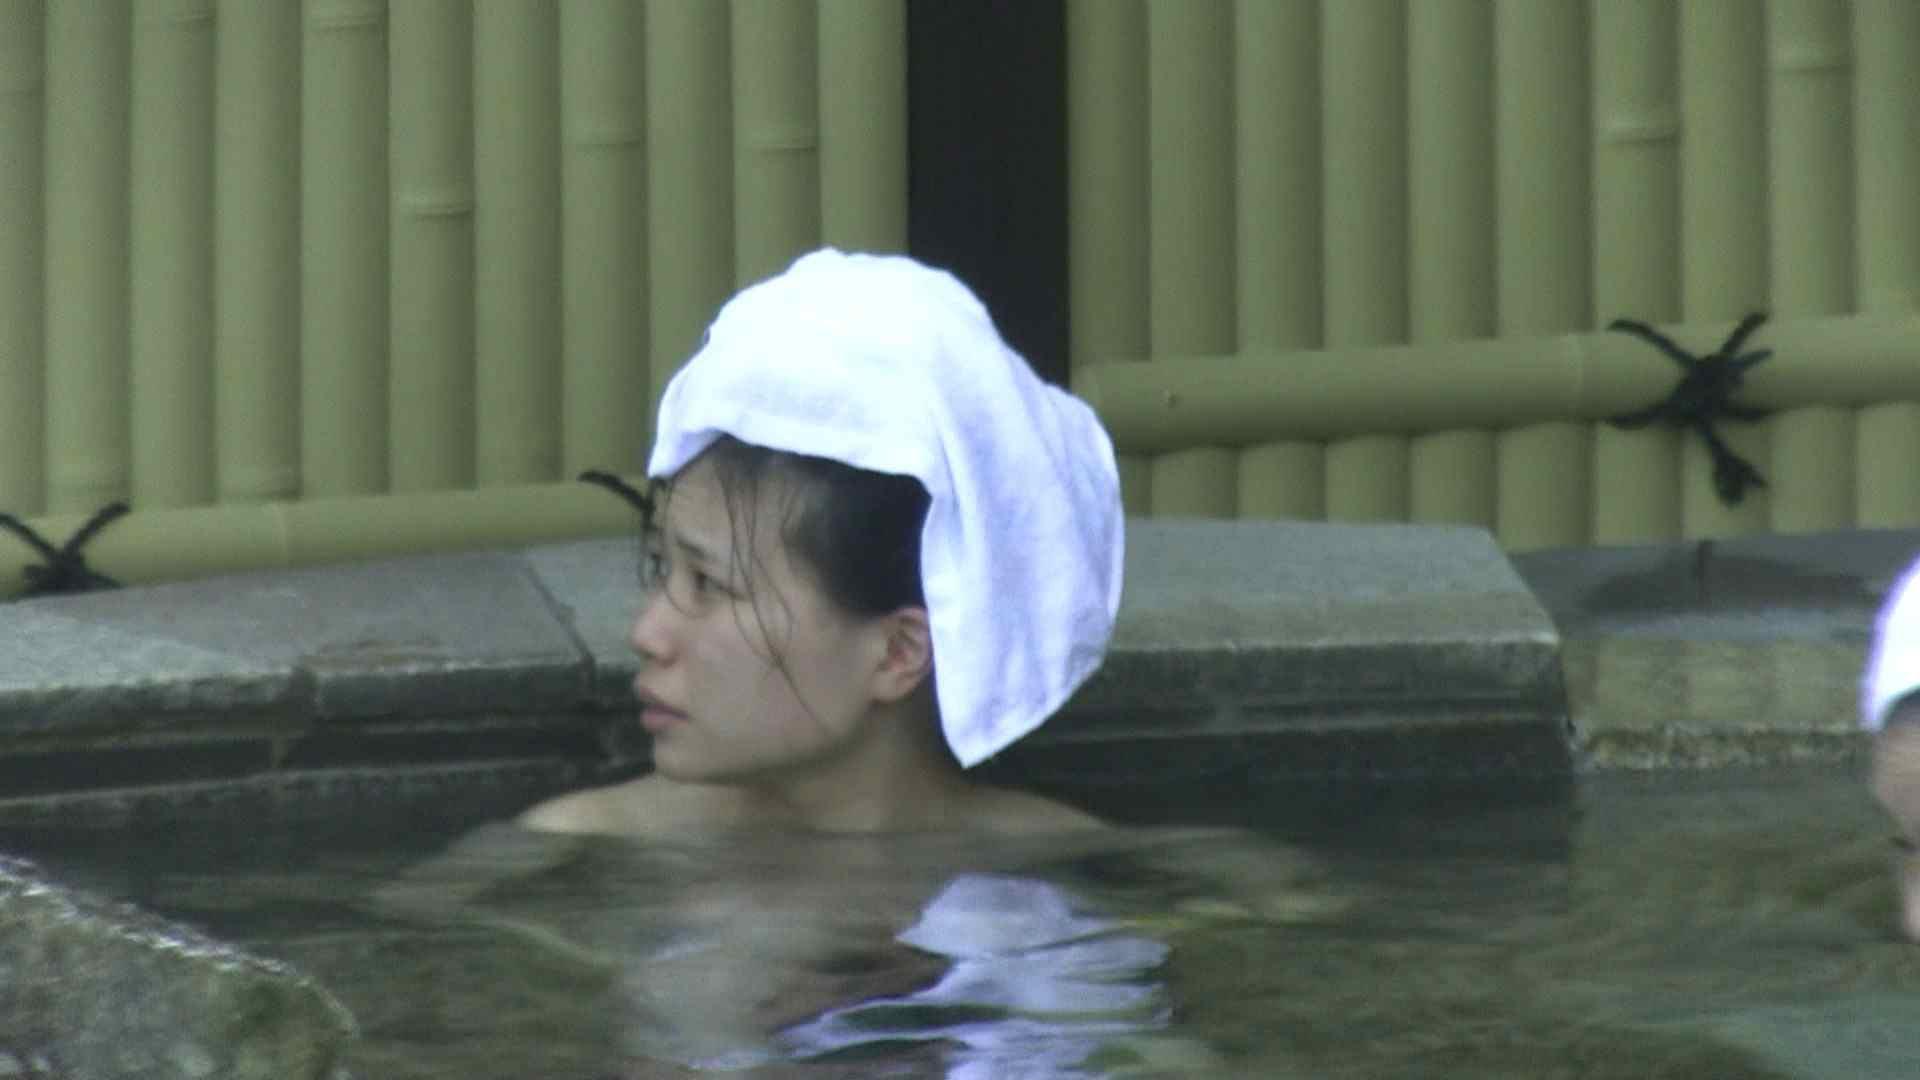 Aquaな露天風呂Vol.183 盗撮 | OLセックス  69画像 40